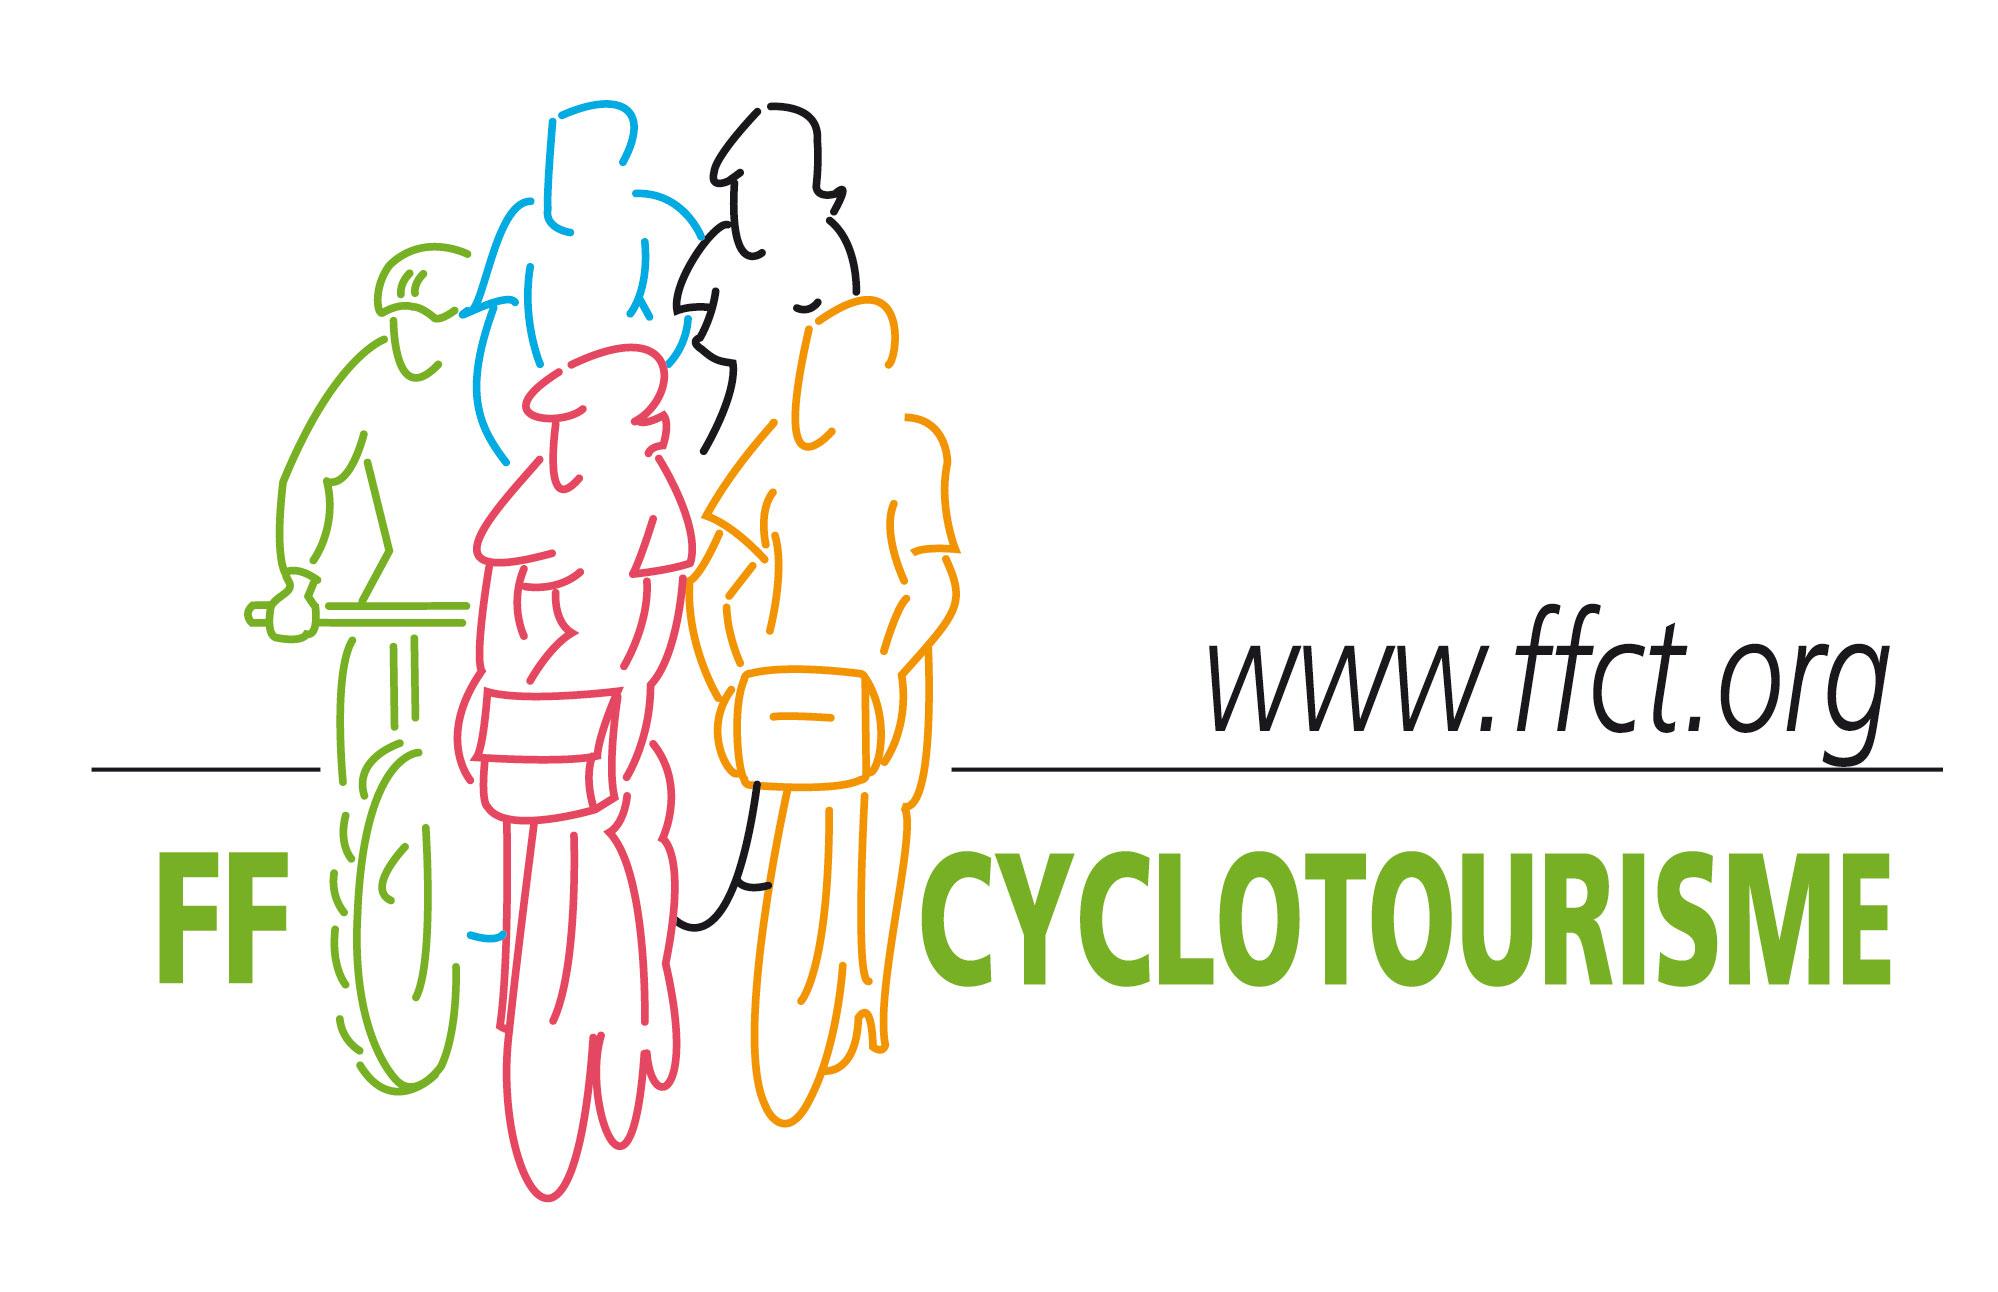 federation francaise cyclotourisme